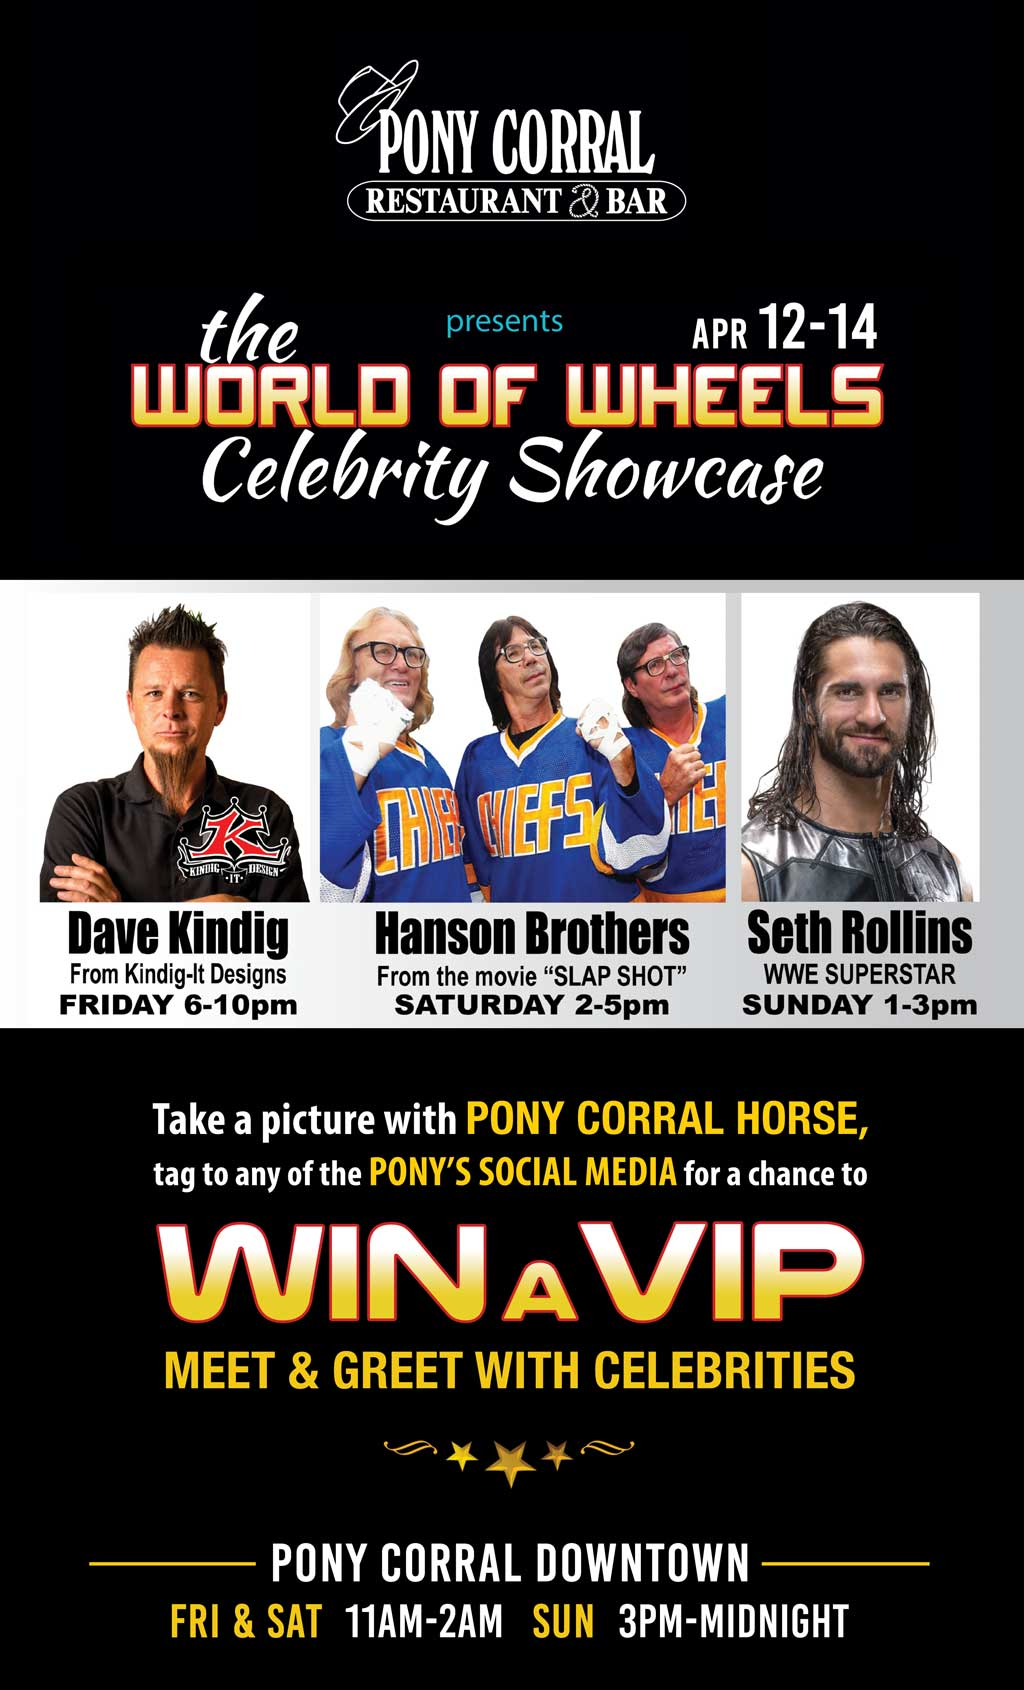 World of Wheels Celebrities Showcase | Pony Corral Restaurant & Bar